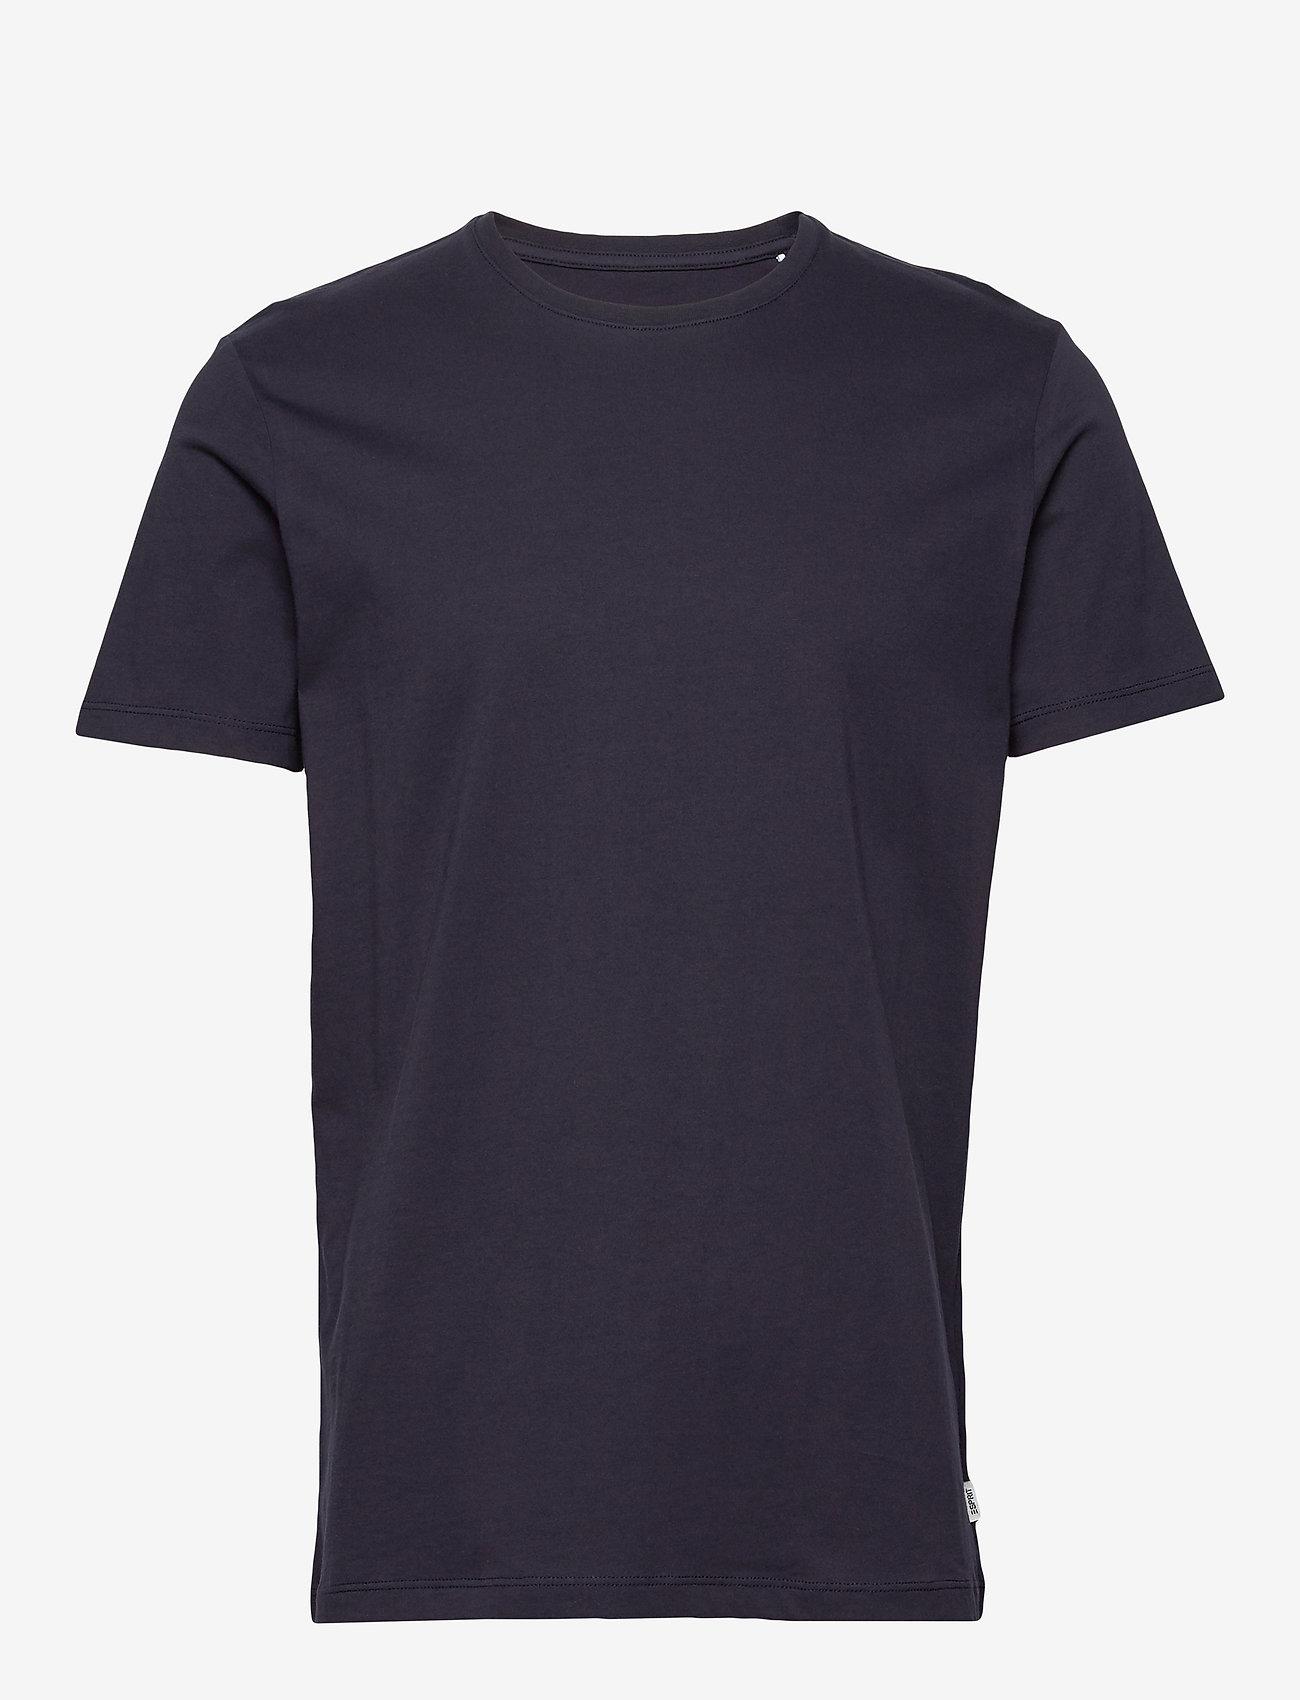 Esprit Casual - T-Shirts - t-shirts basiques - navy - 0